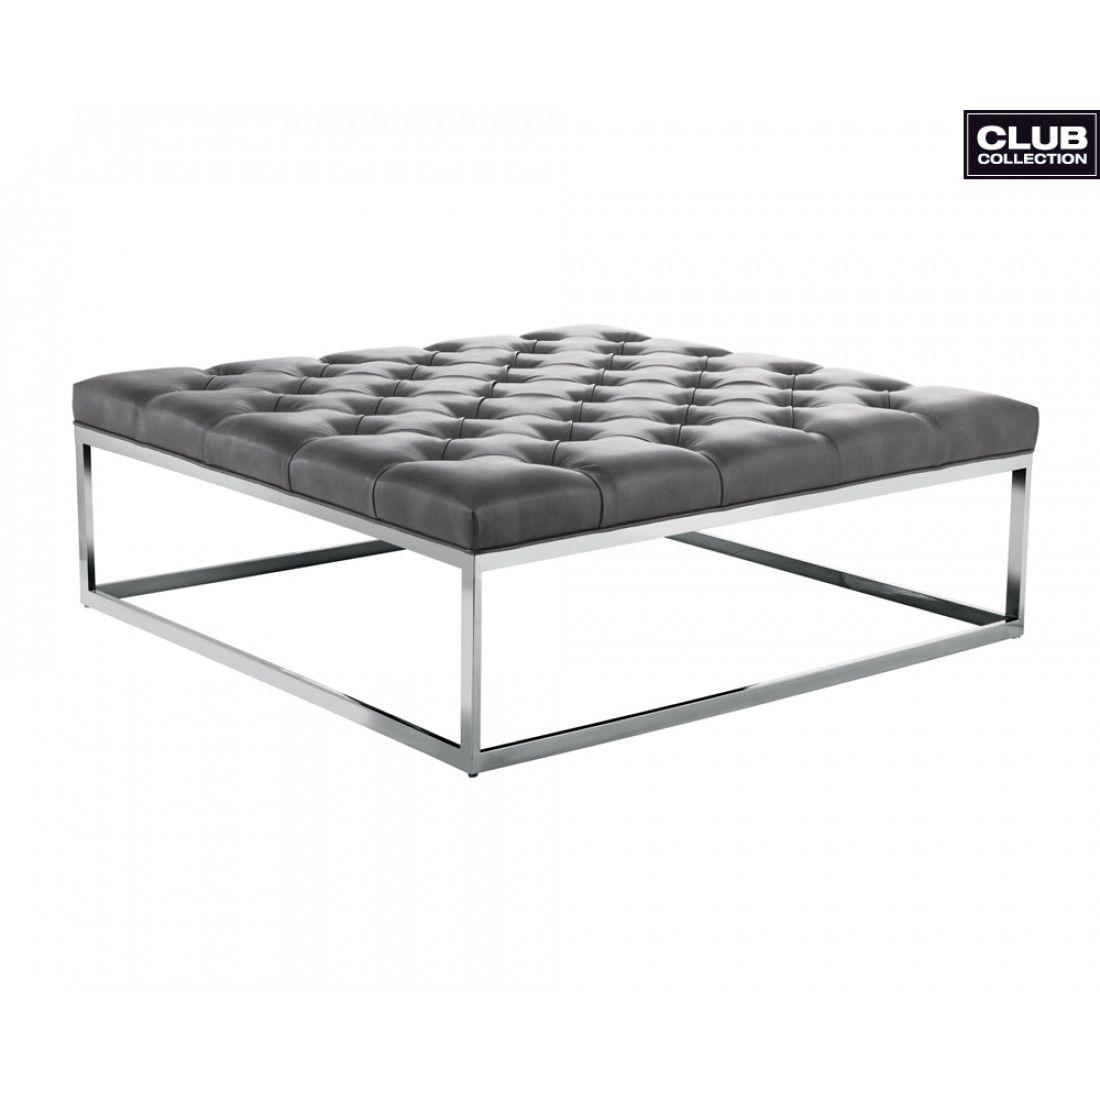 Fantastic Sutton Square Ottoman Large Grey Leather In 2019 Leather Frankydiablos Diy Chair Ideas Frankydiabloscom